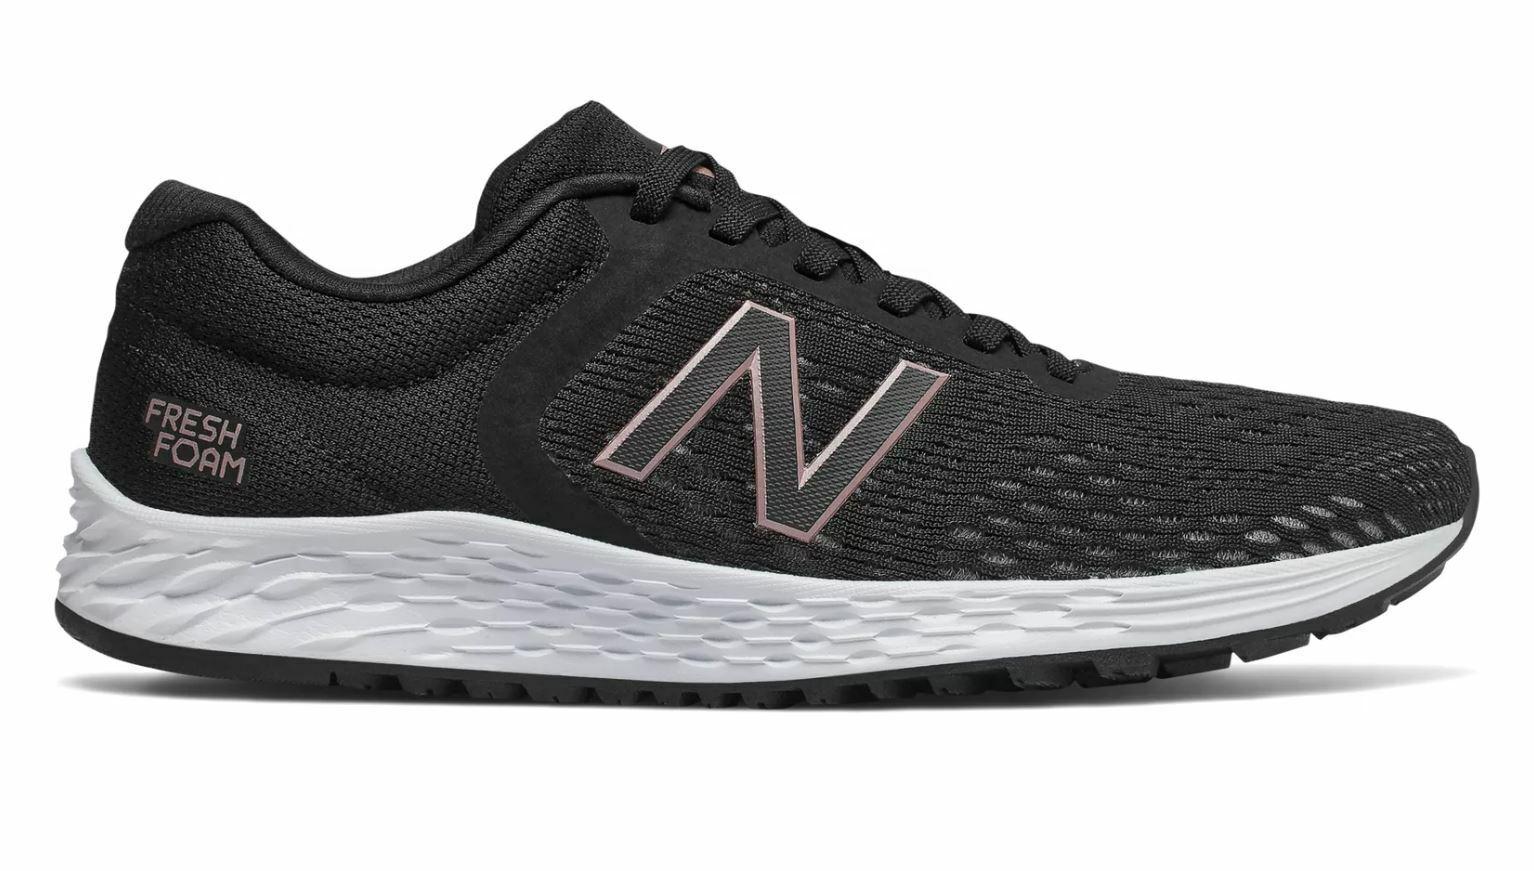 LATEST RELEASE New Balance Arishi Womens Running shoes (D) (WARISLW2) (048)